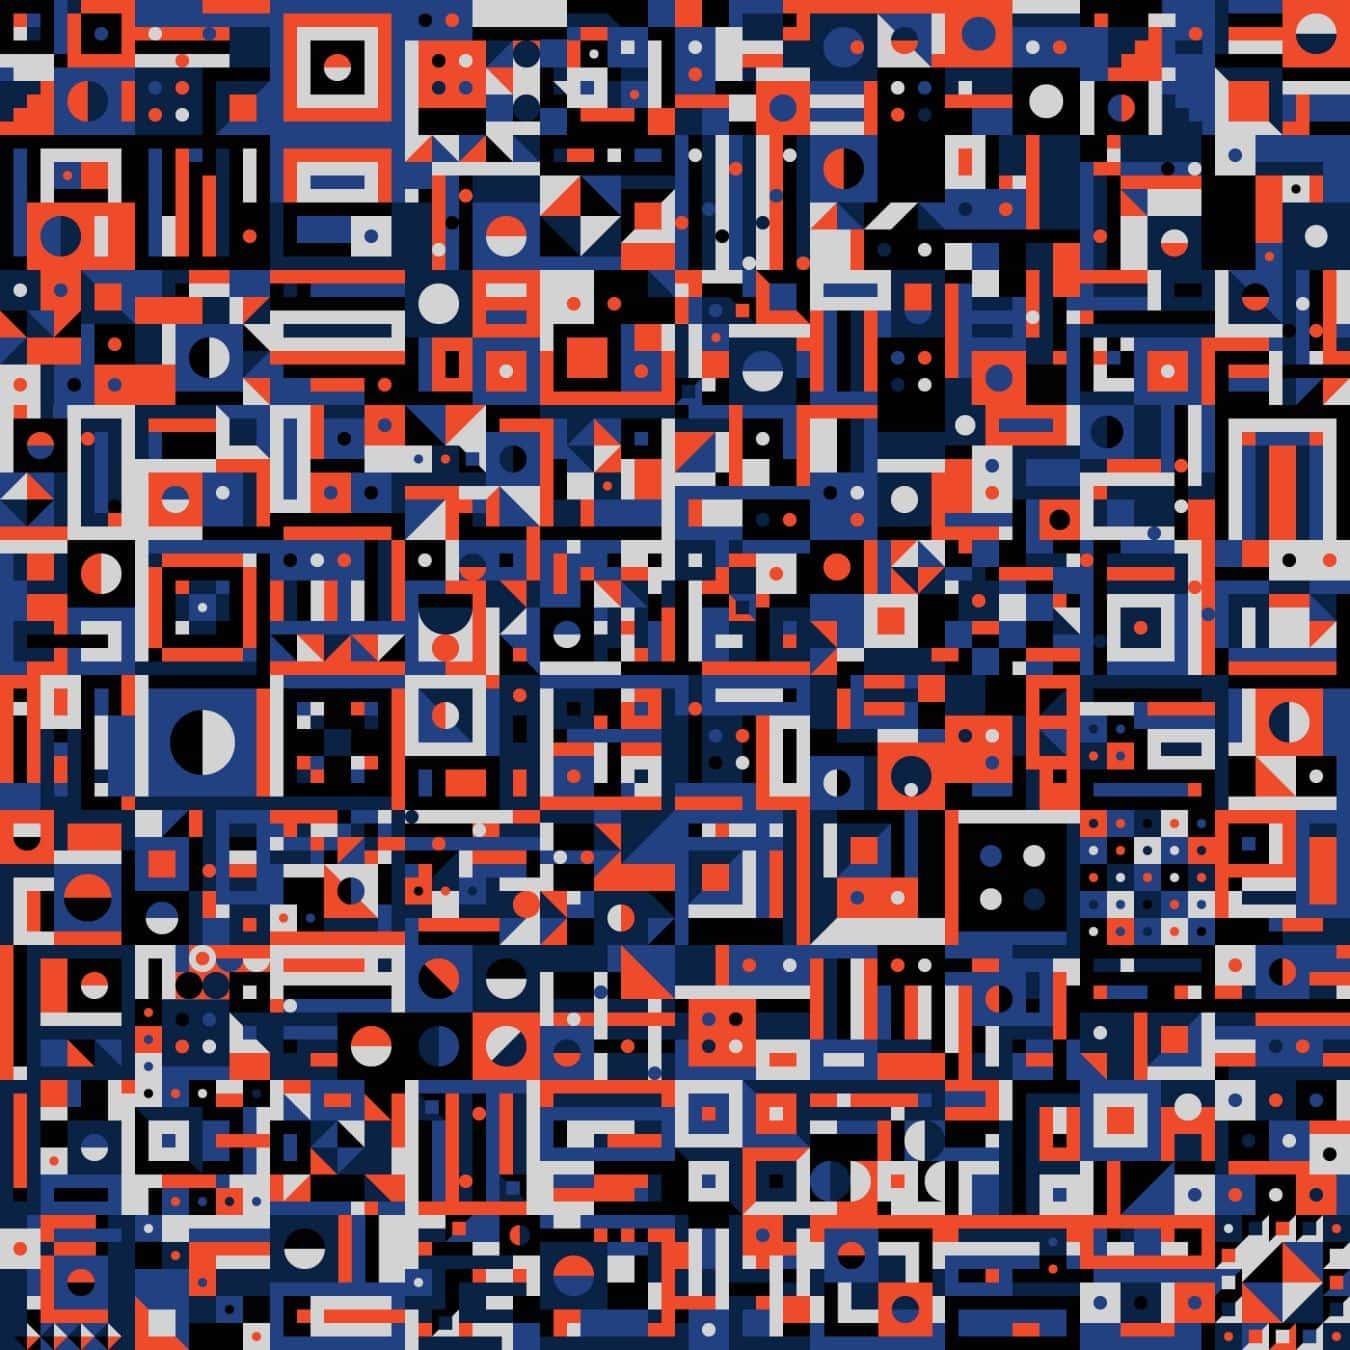 100 Boxes by Daniel Zucco